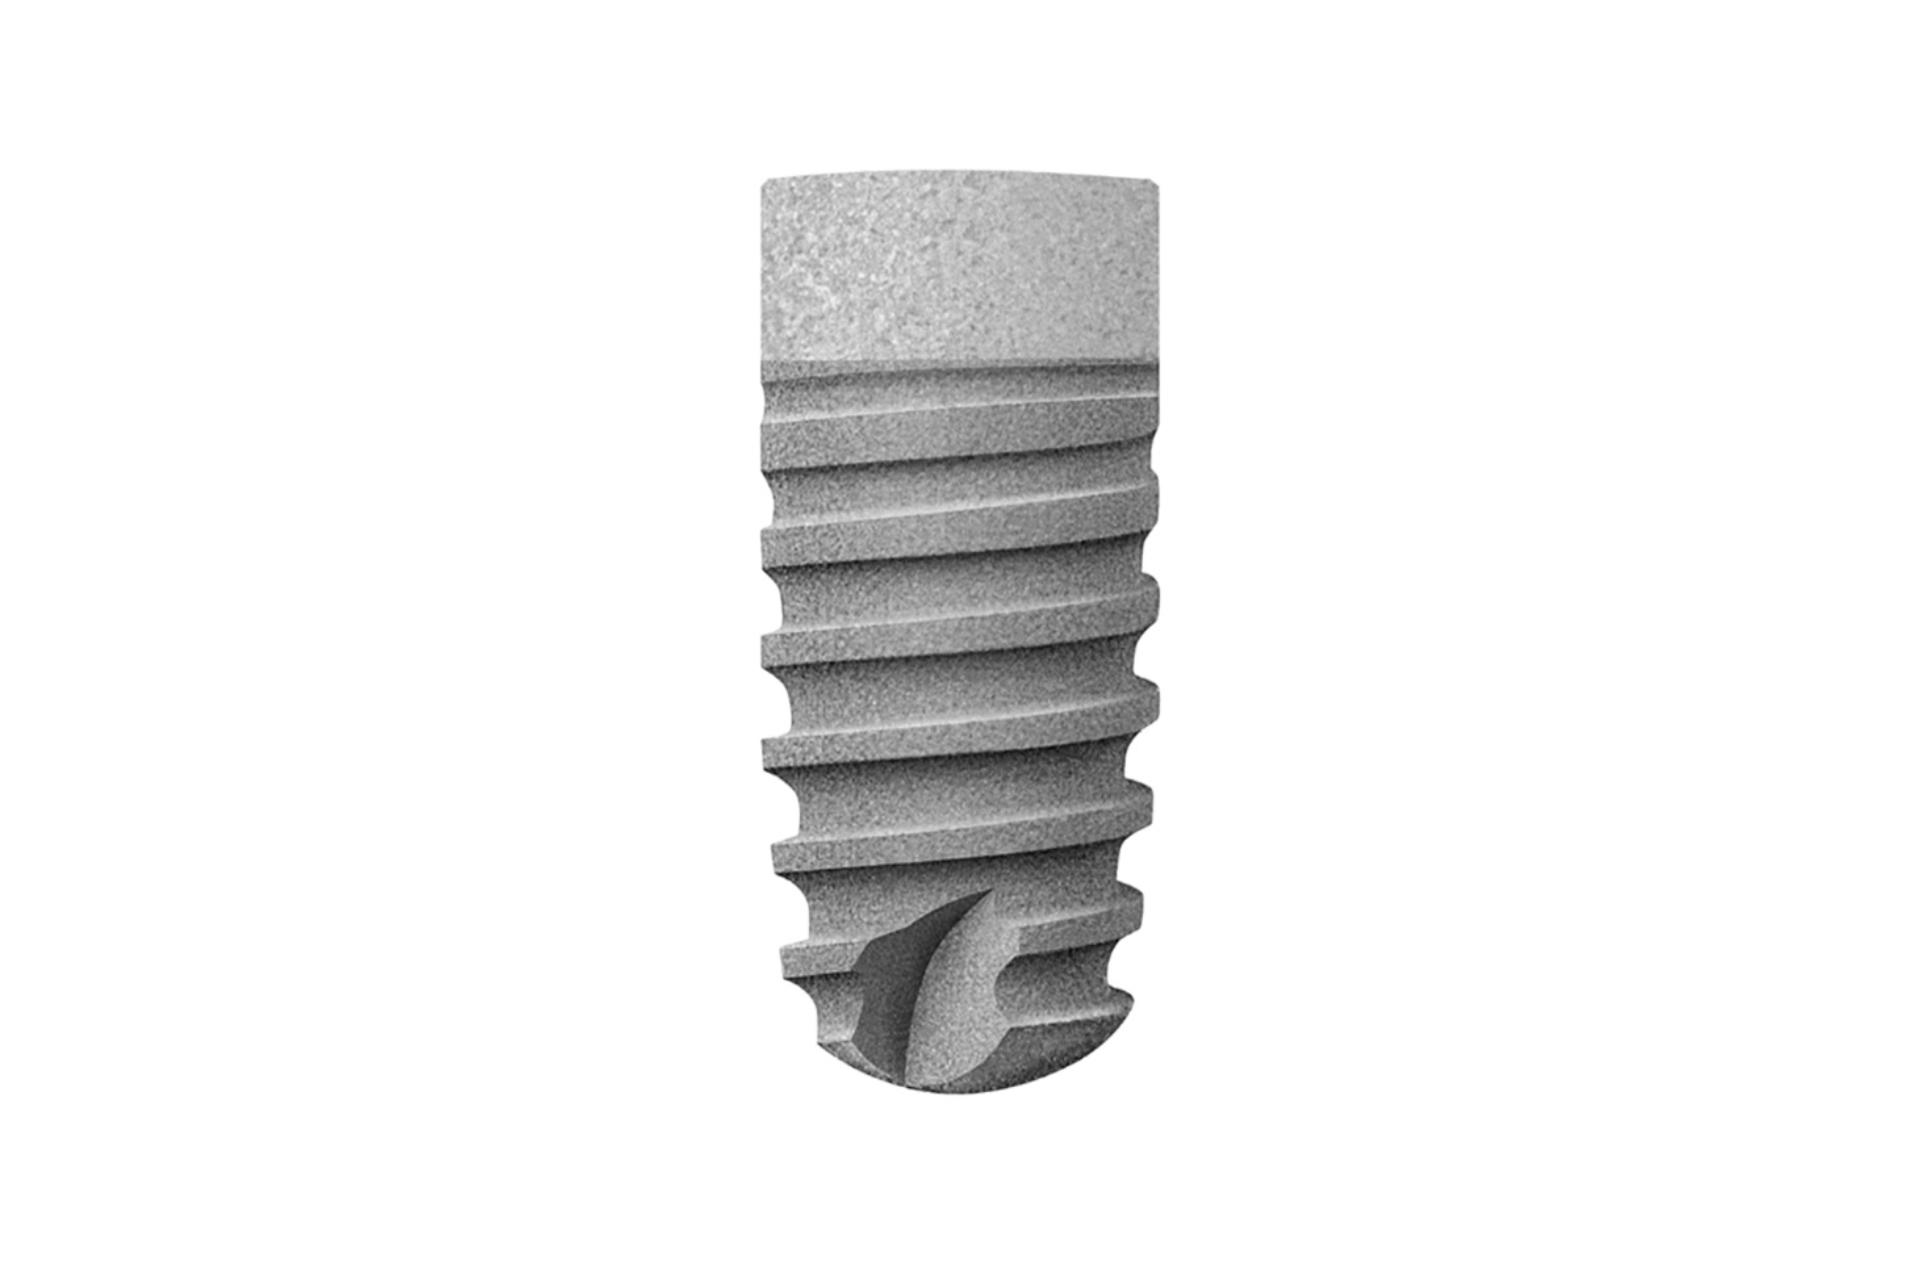 Ankylos implant insertion